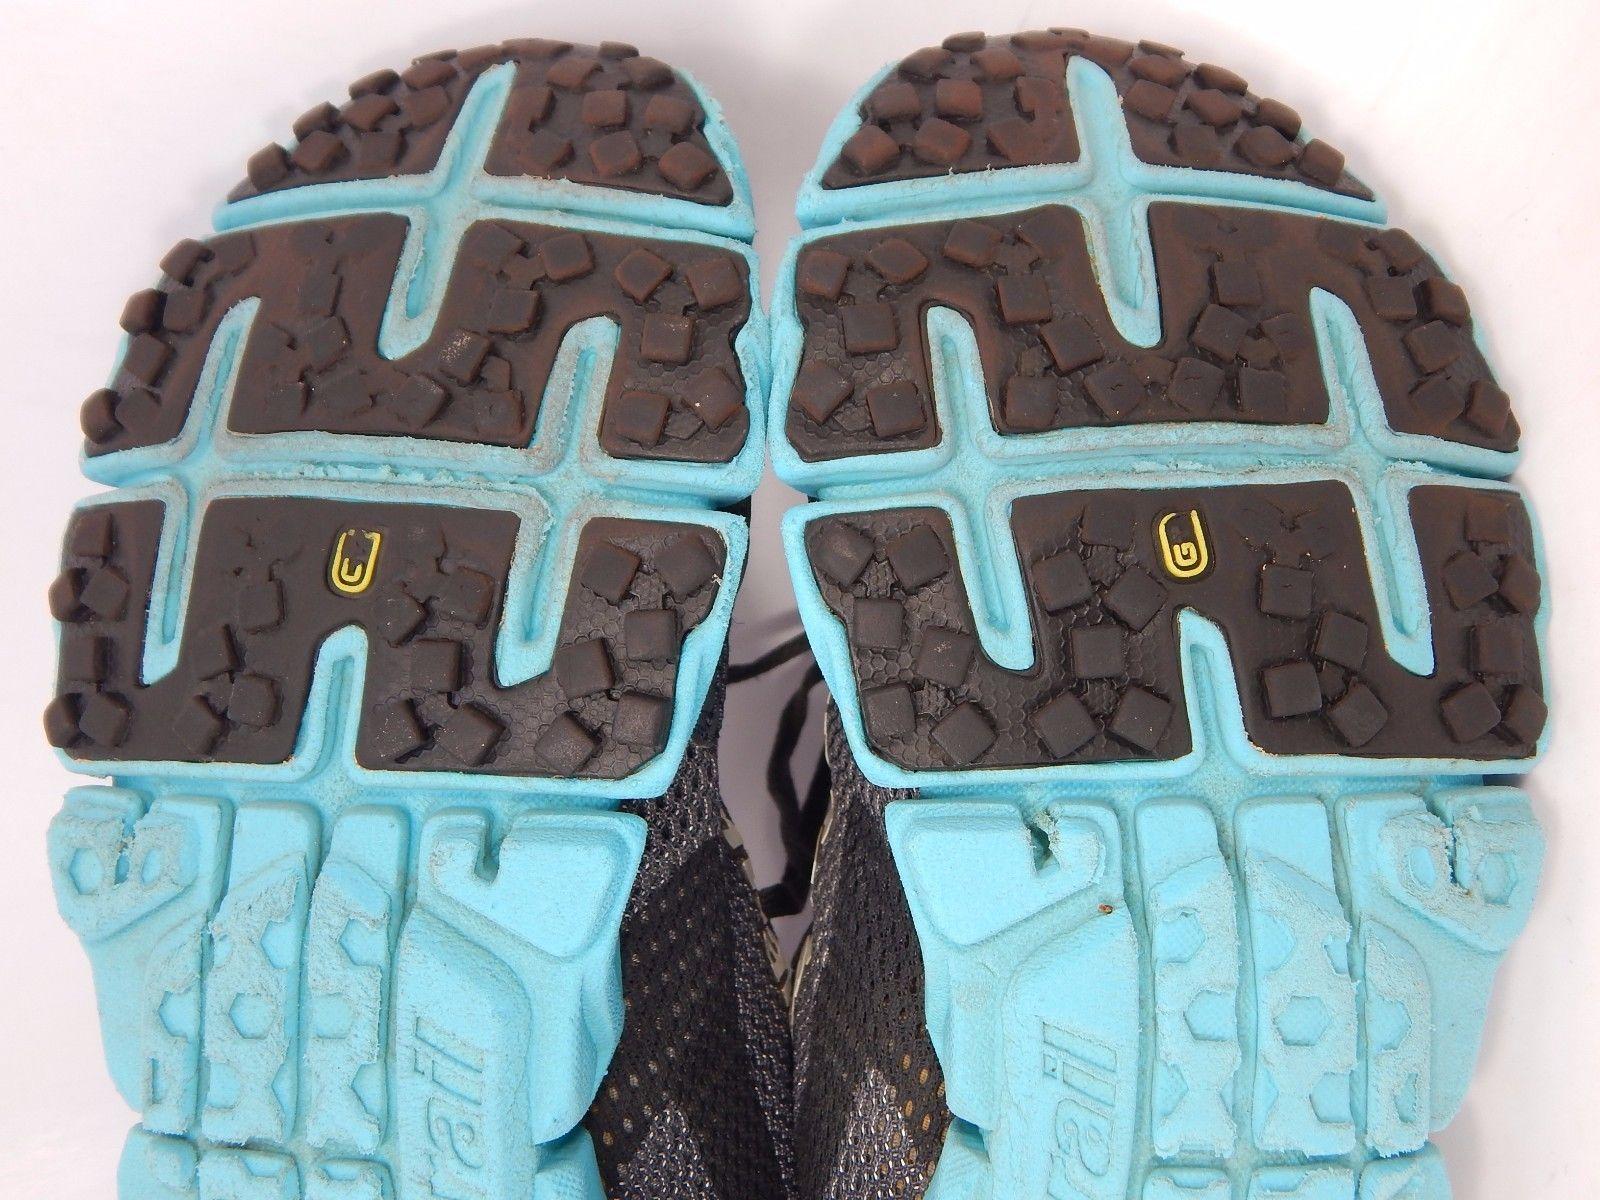 Montrail FluidFlex Women's Trail Running Shoes Size US 6.5 M (B) EU 37.5 Gray